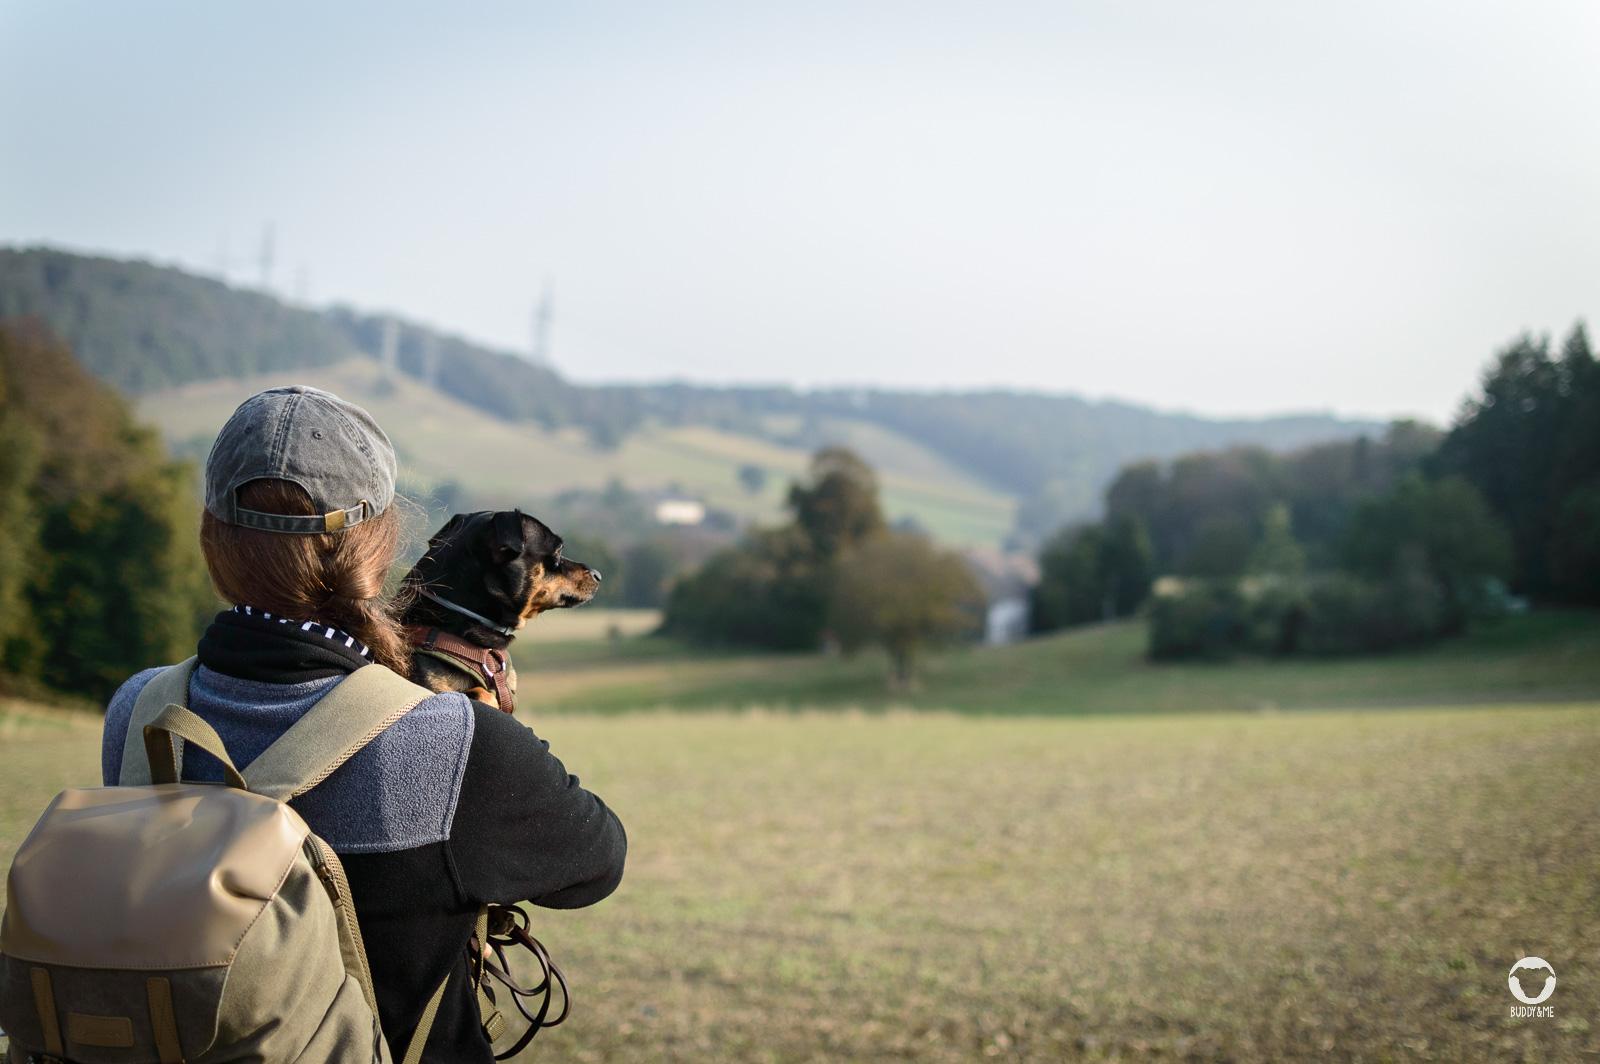 Pinscher Buddy, Buddy and Me, Hundeblog, Dogblog, Ruhrgebiet, Leben mit Hund, Hundealltag, Bewegung, Glück, Team, Gemeinsam